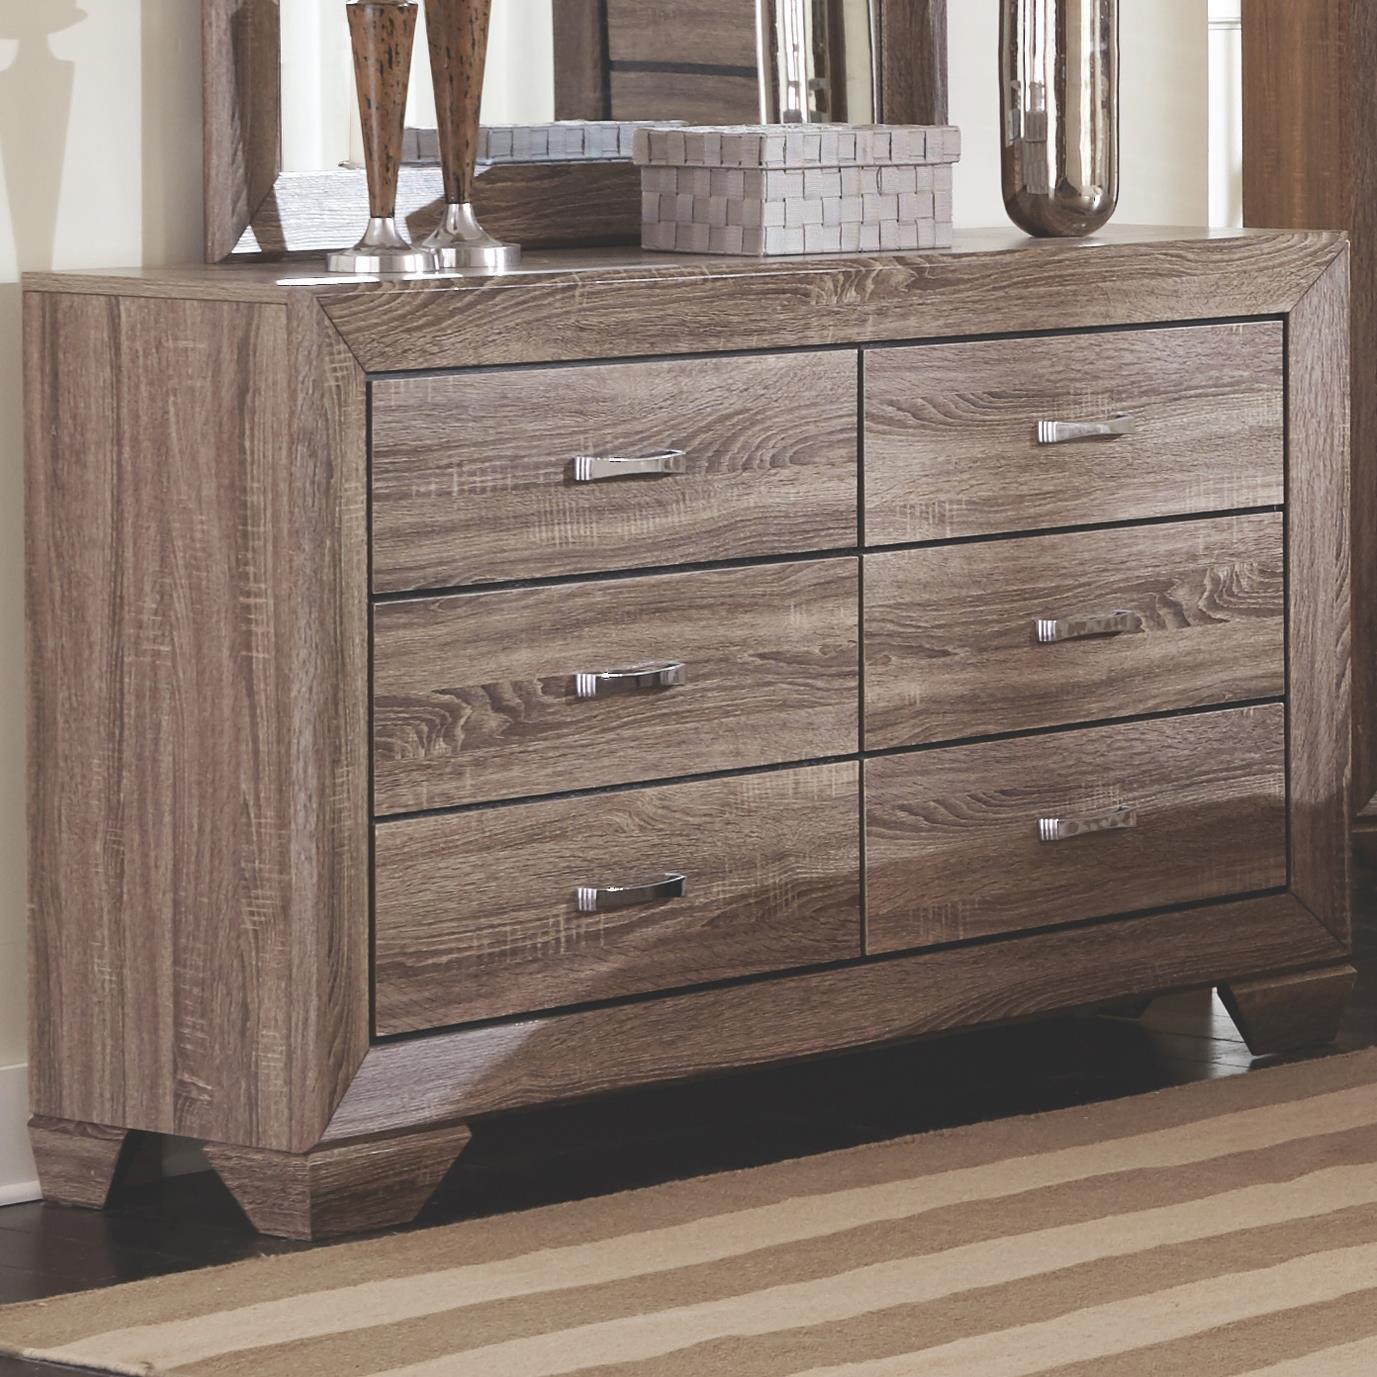 Kauffman Dresser by Coaster at Northeast Factory Direct